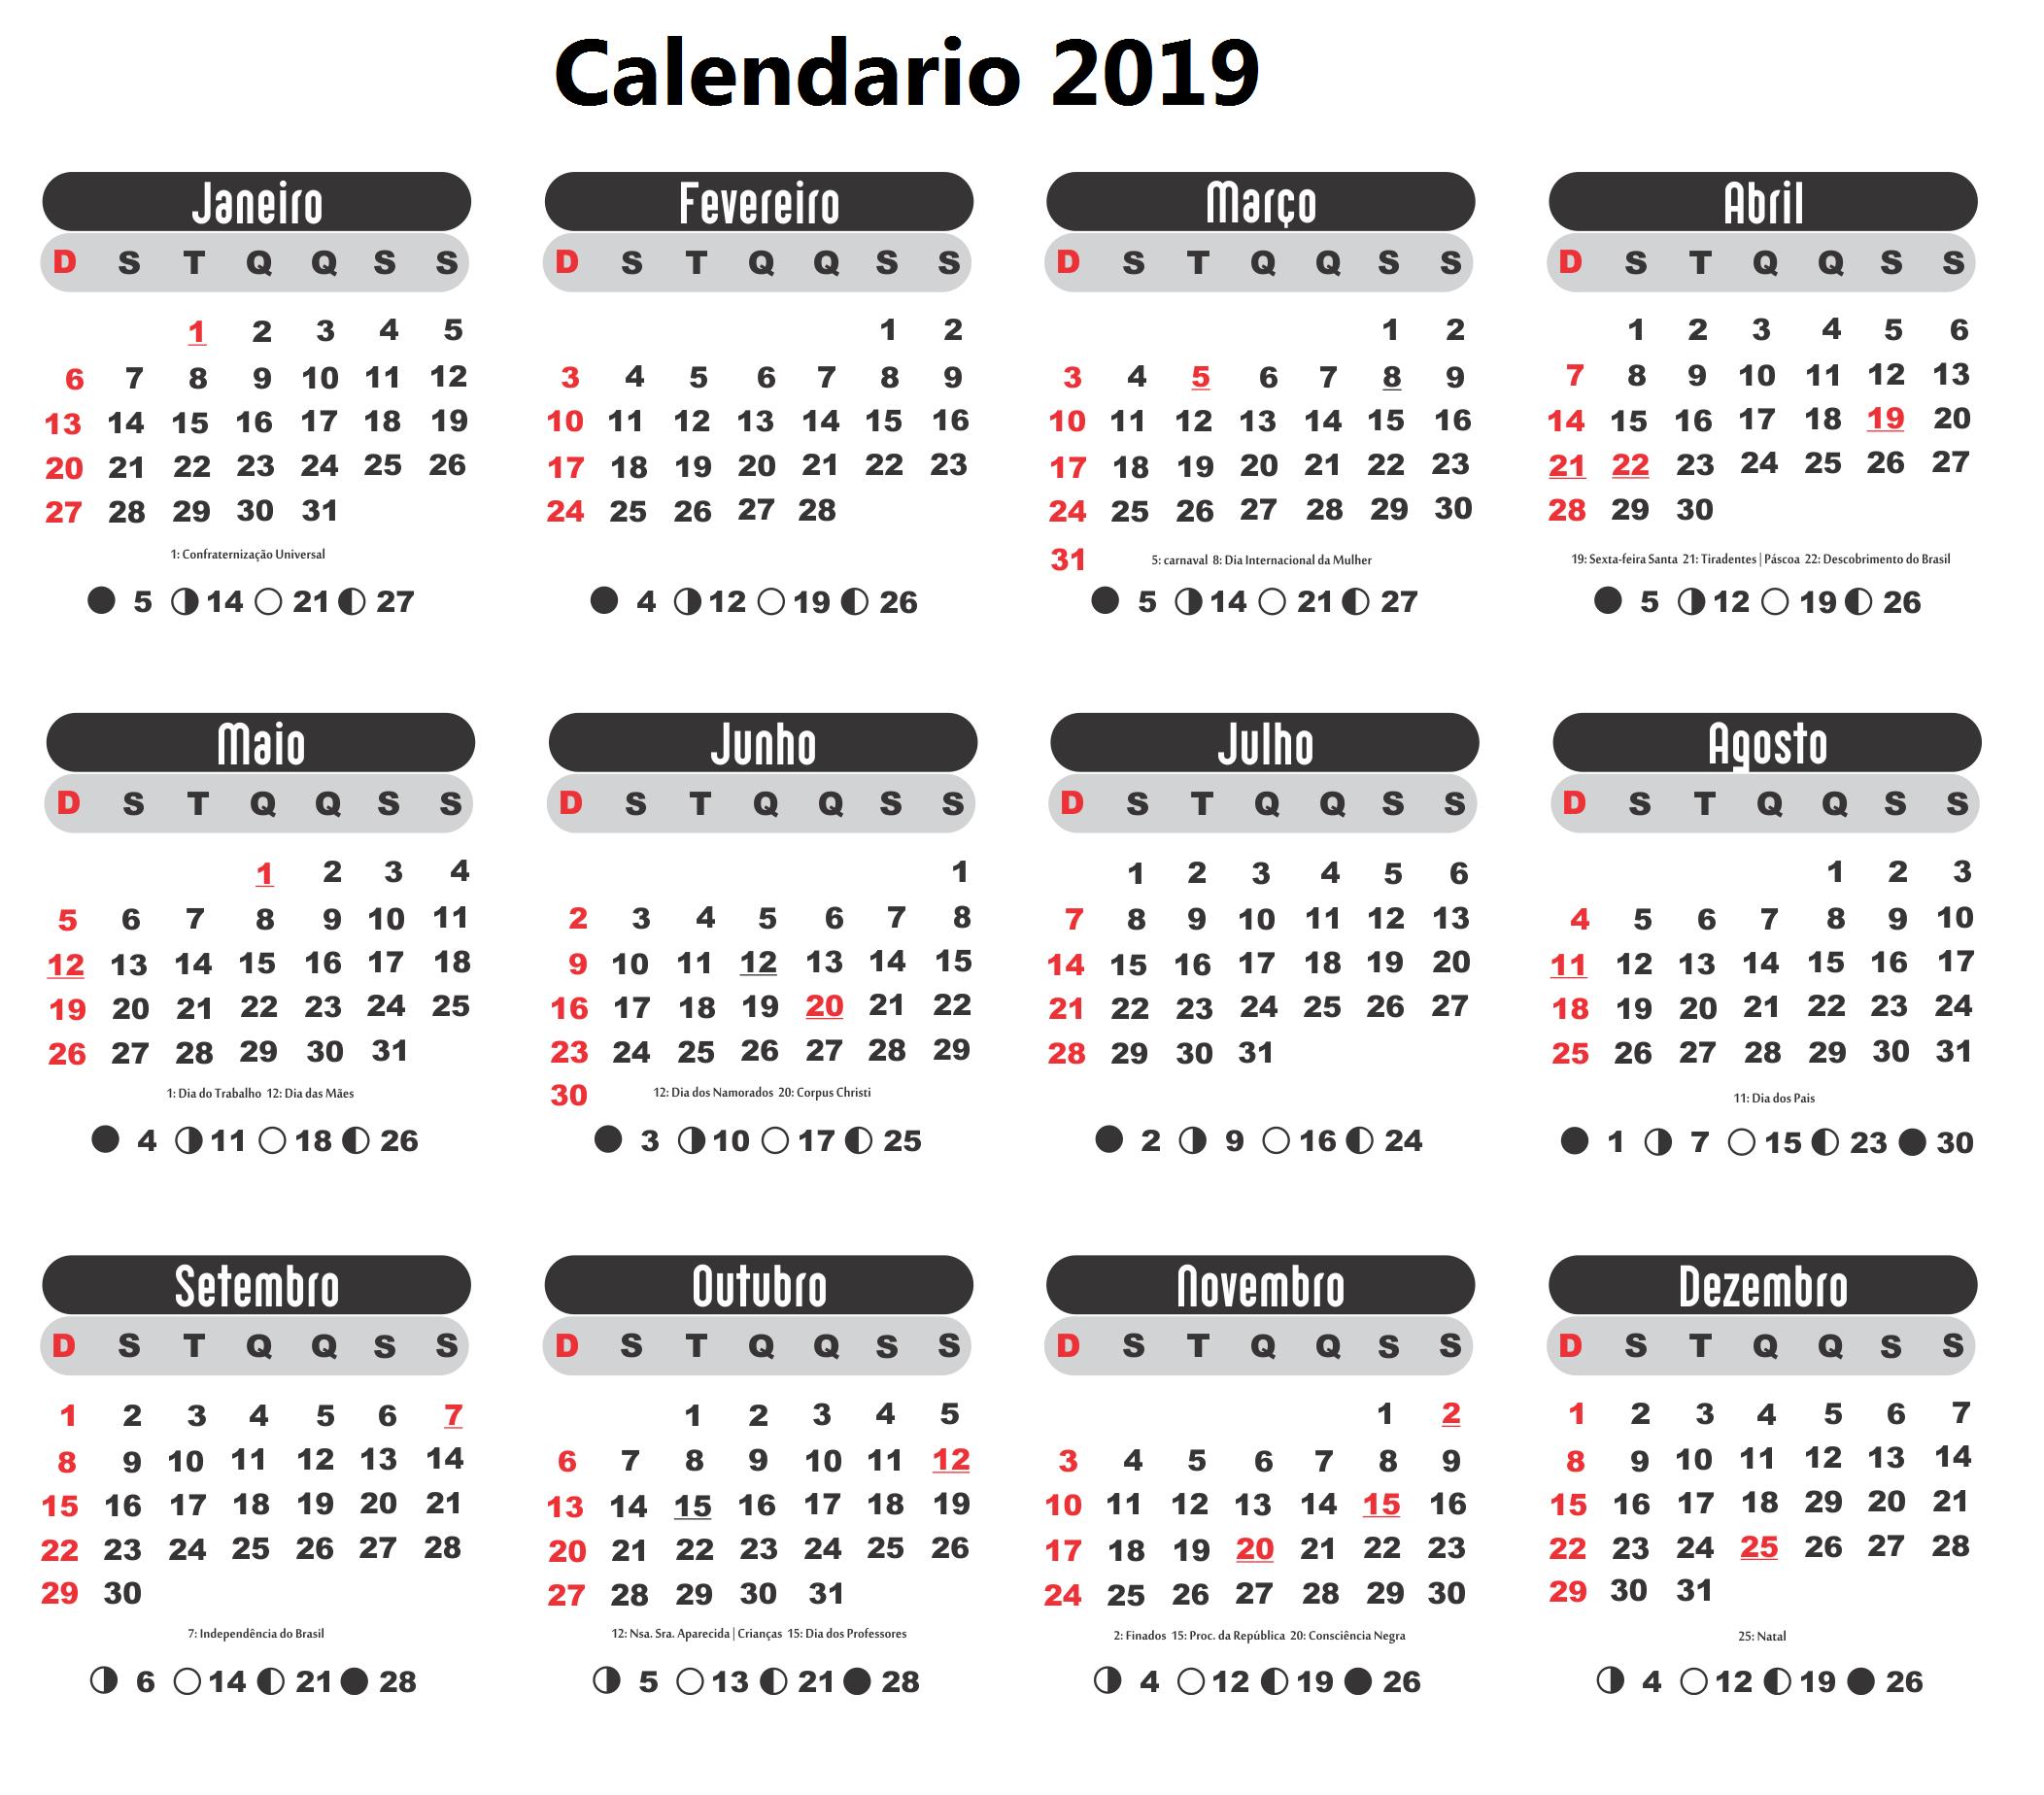 Calendario 2019 Da Stampare Calendario 2019 Da Stampare Bullet